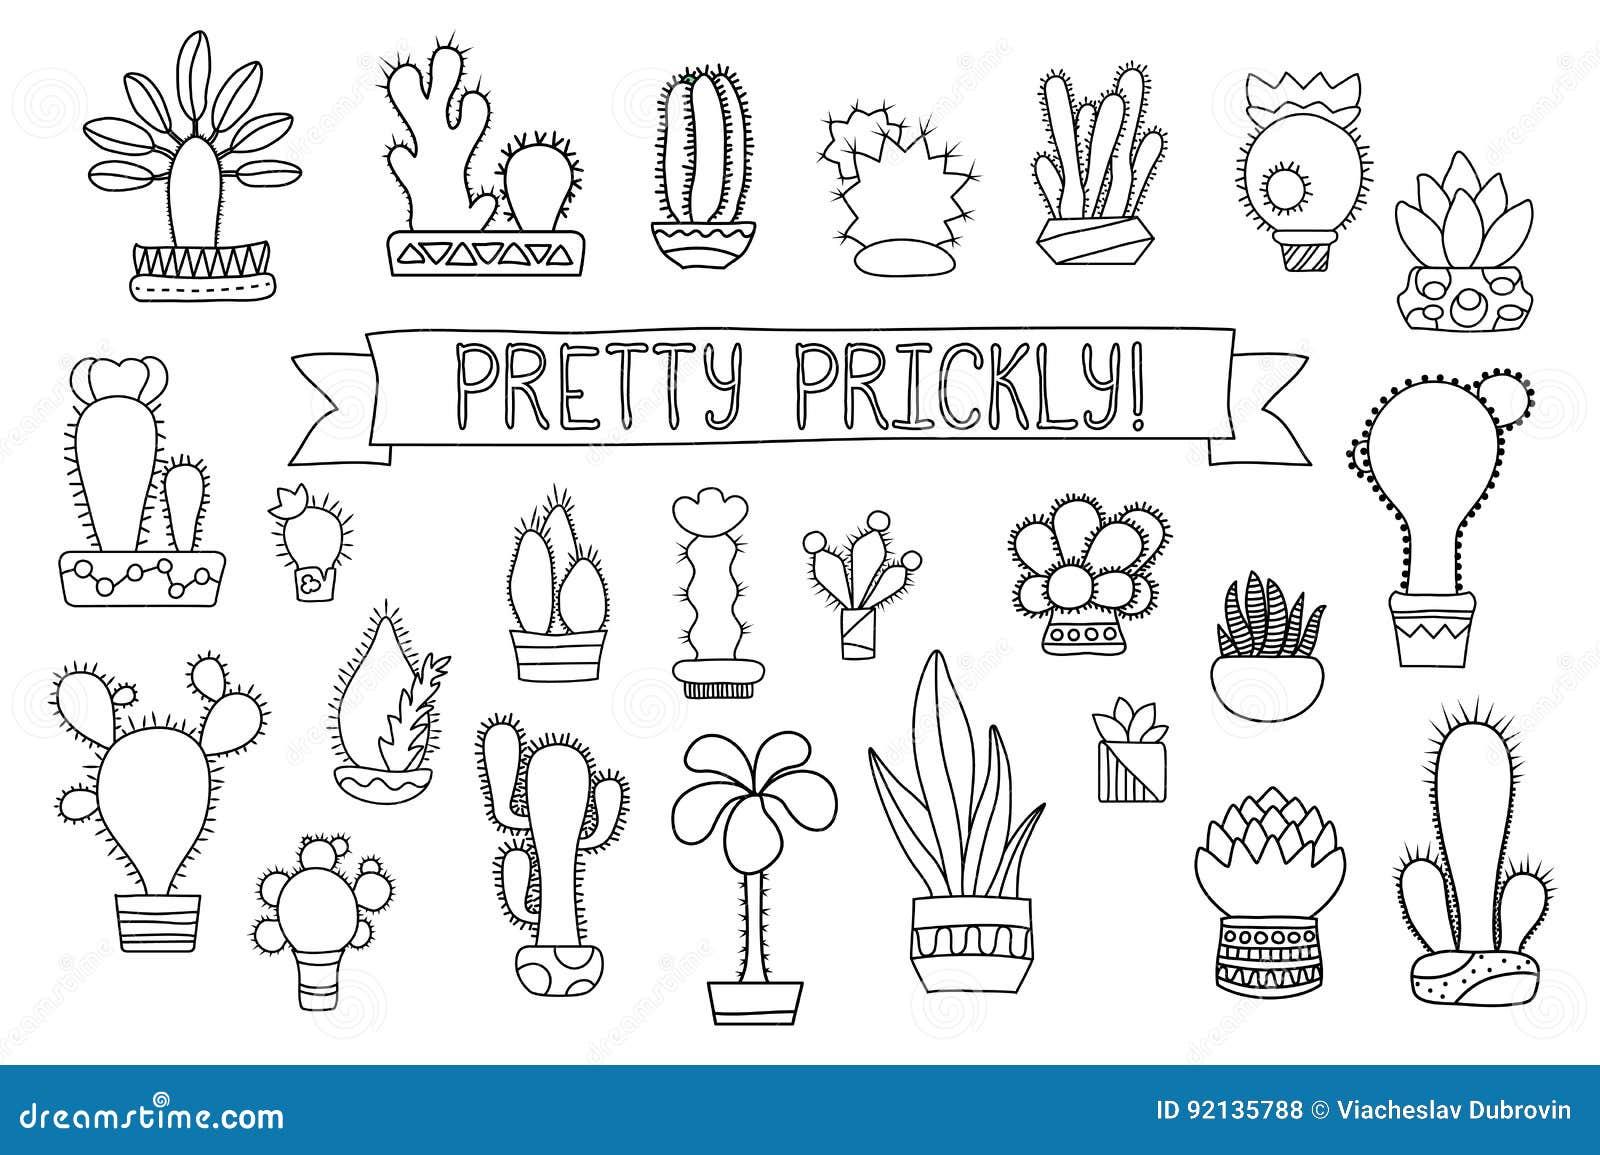 Kleurplaat Cactus Simpel Thin Line Cactus And Succulent Clipart Potted Cactus And